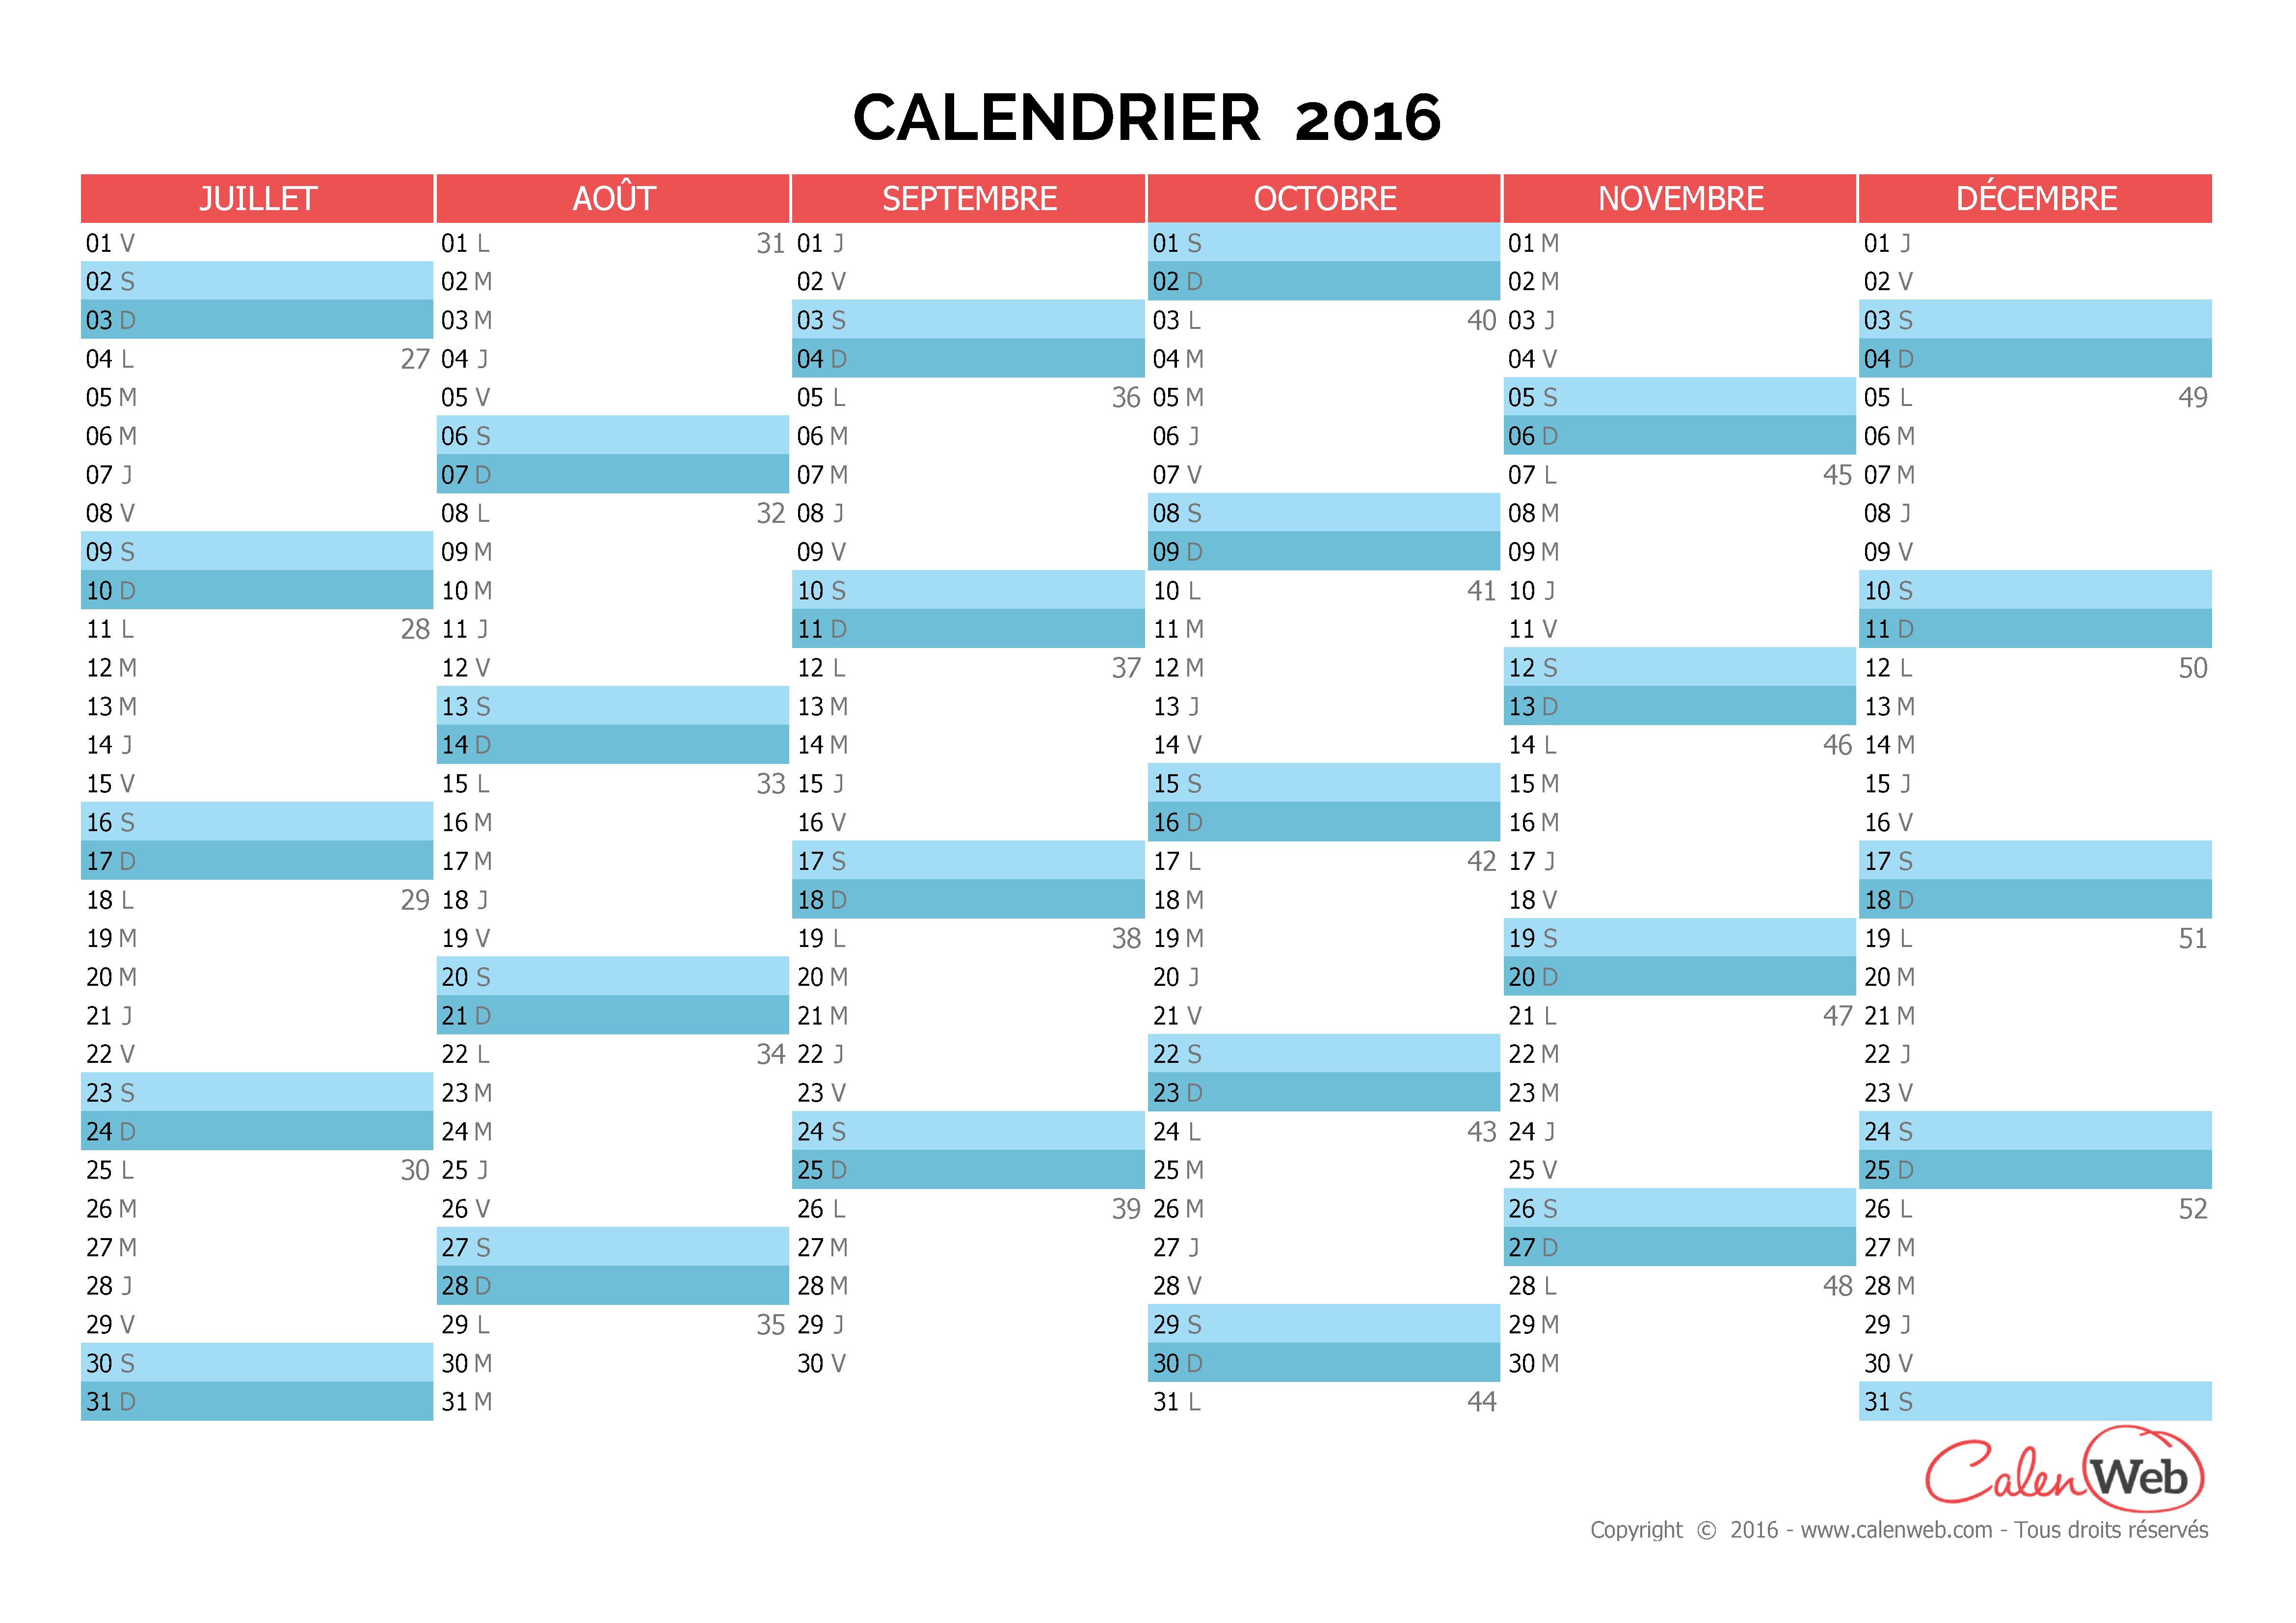 Calendrier semestriel - Année 2016 Planning semestriel vierge ...